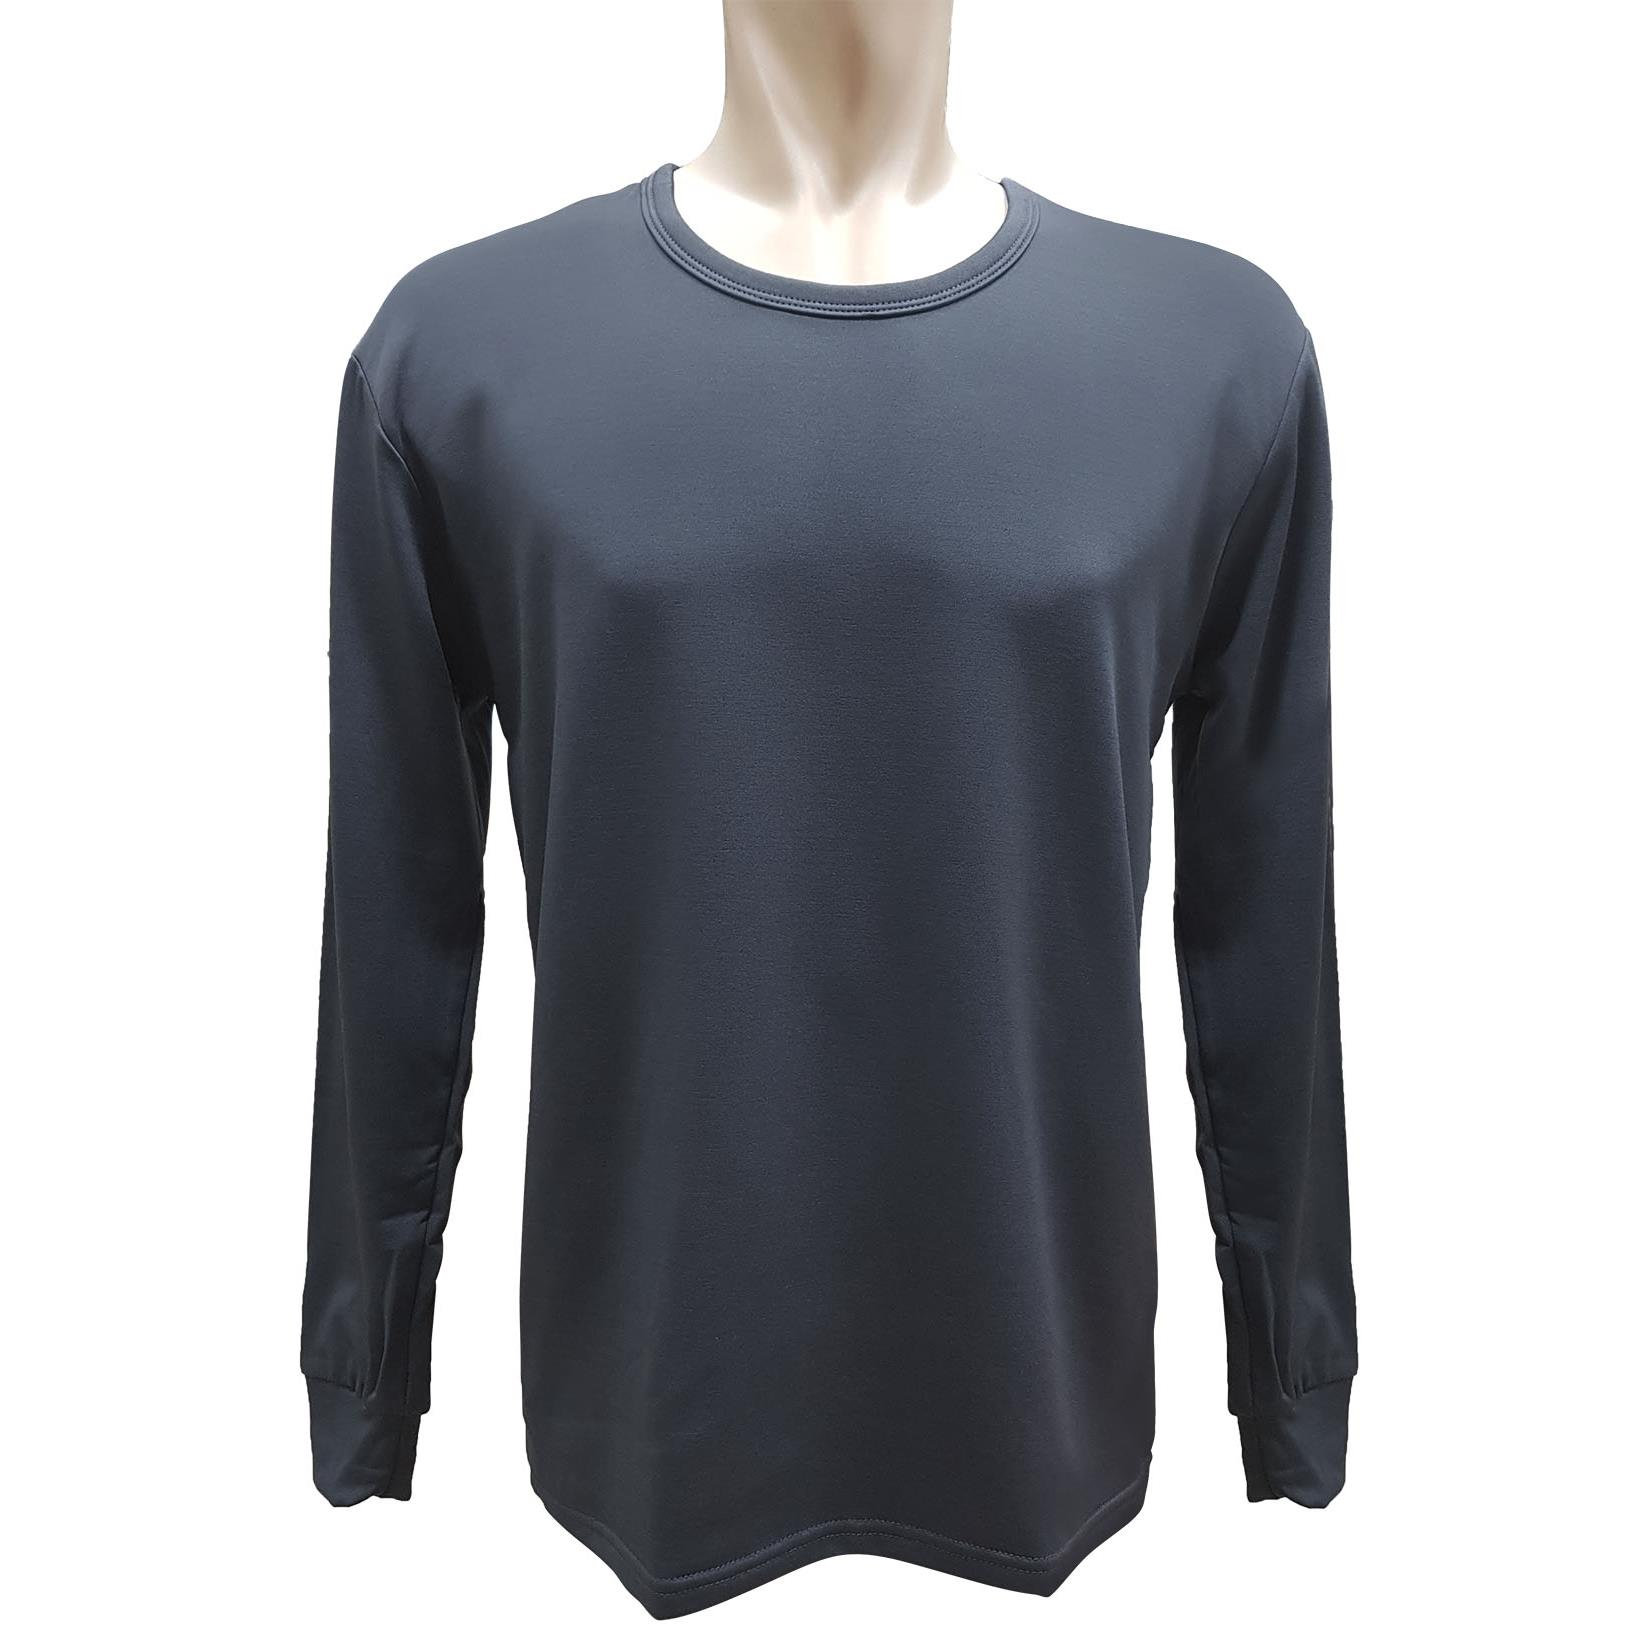 【LOZY】圓領男士刷毛保暖衣-深灰